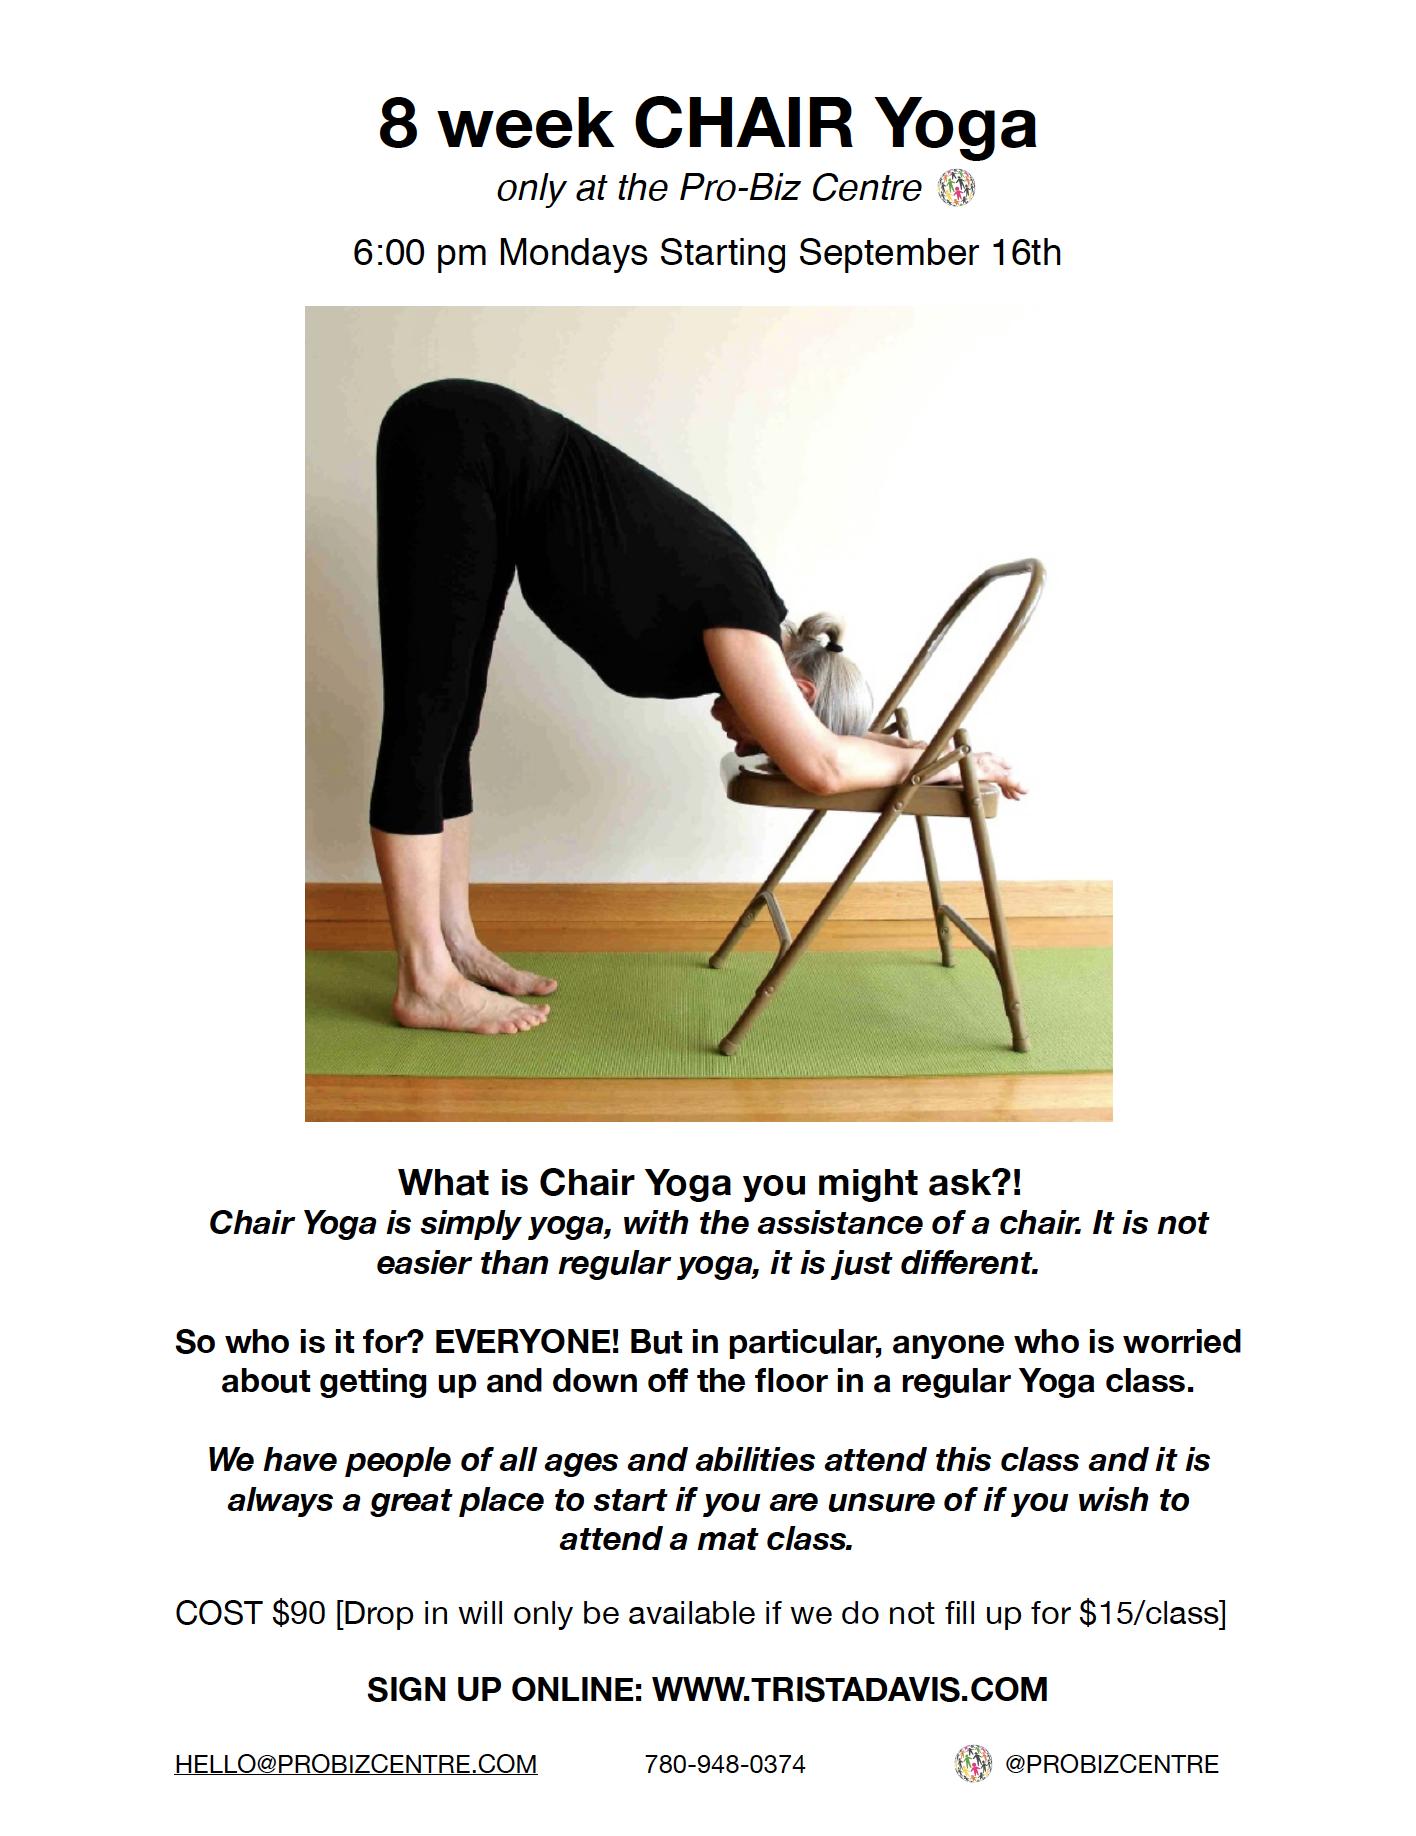 Chair Yoga with Trista Davis